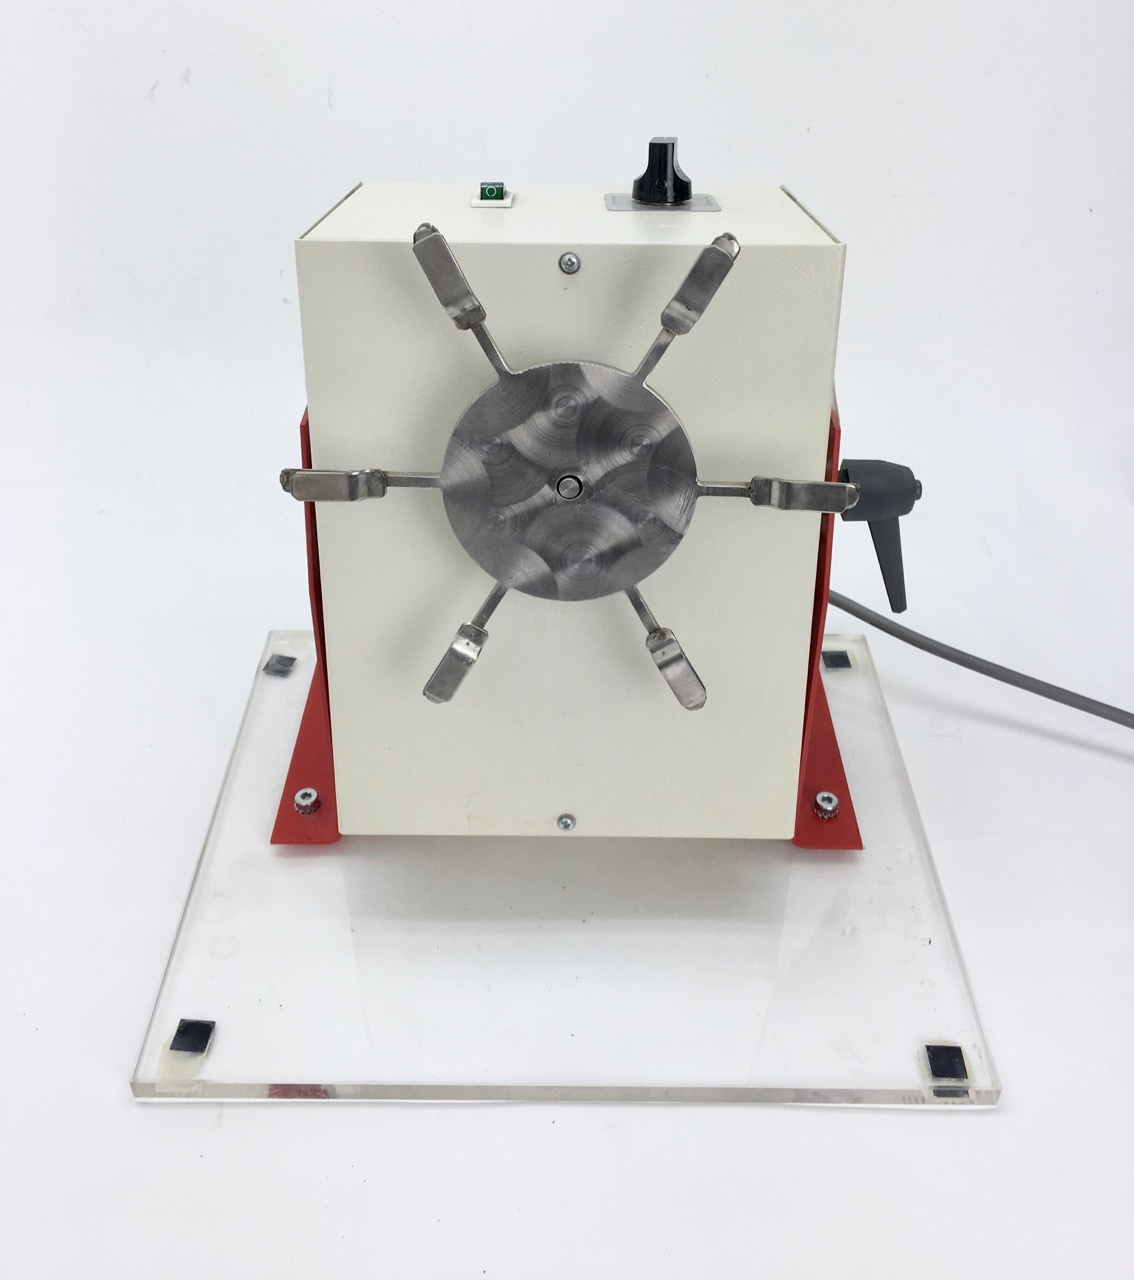 LTF Fröbel Labortechnik GmbH CMV-ROM rotary wheel